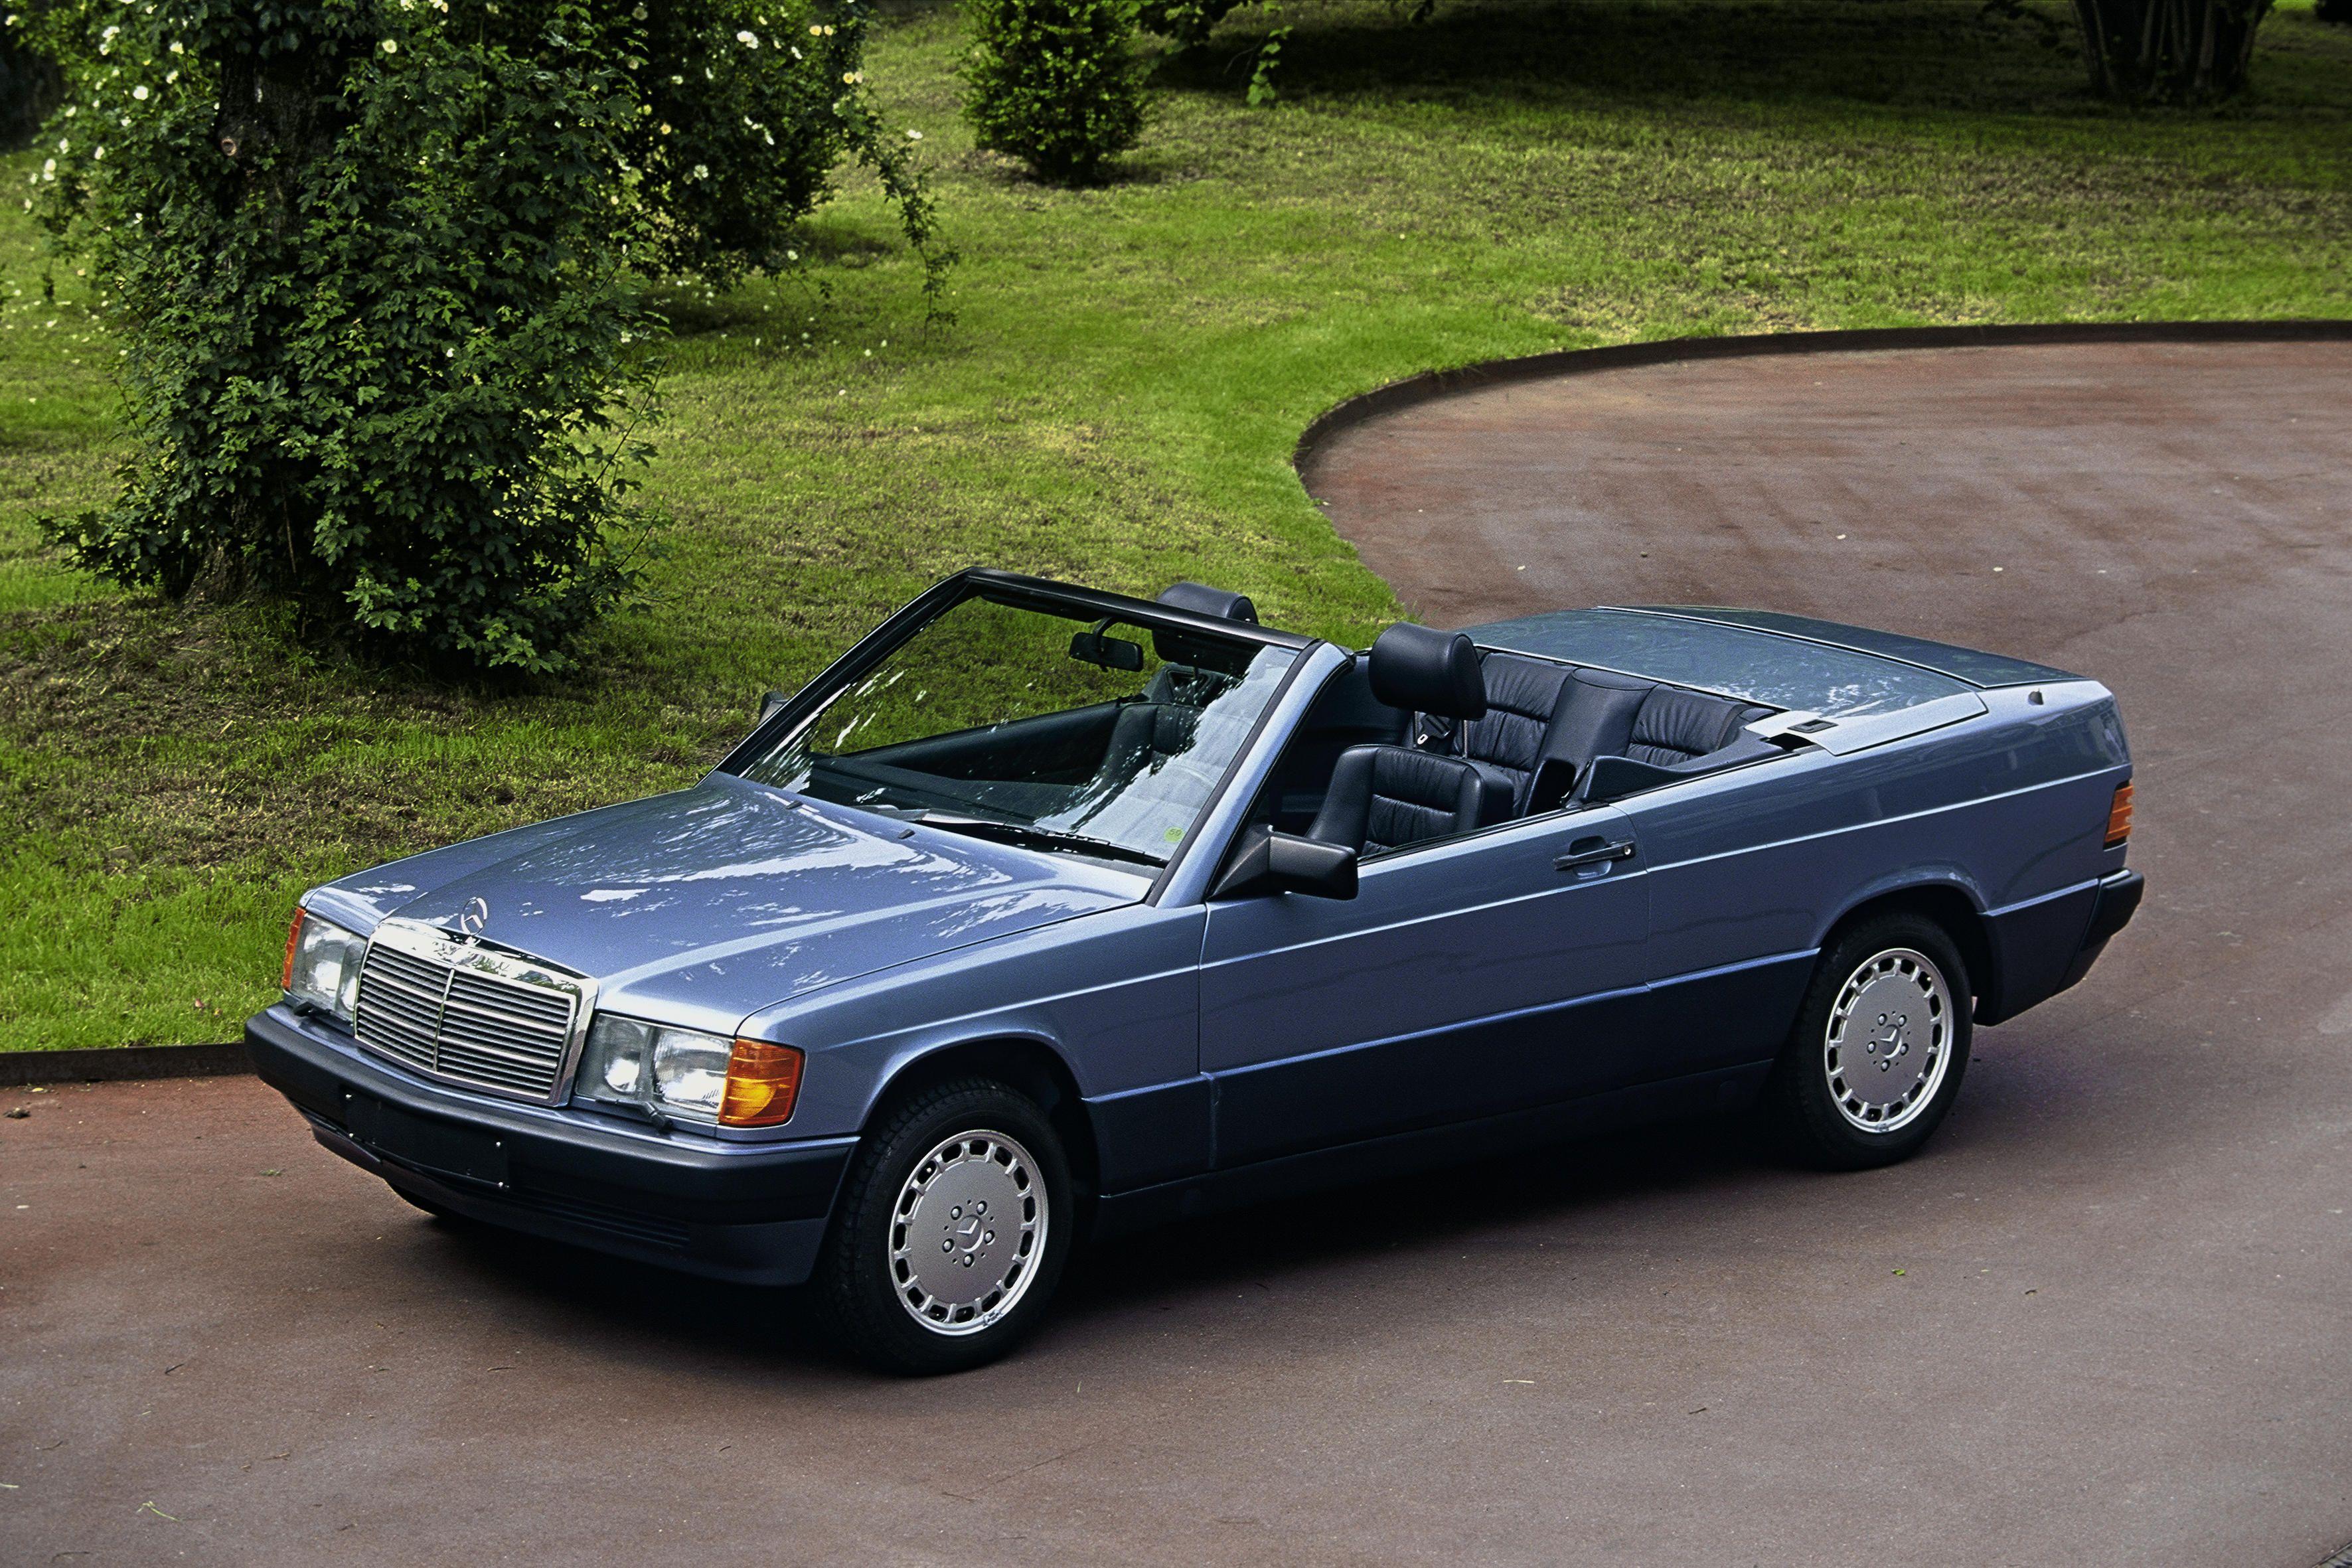 Mercedes benz 190 e cabriolet prototype w201 1989